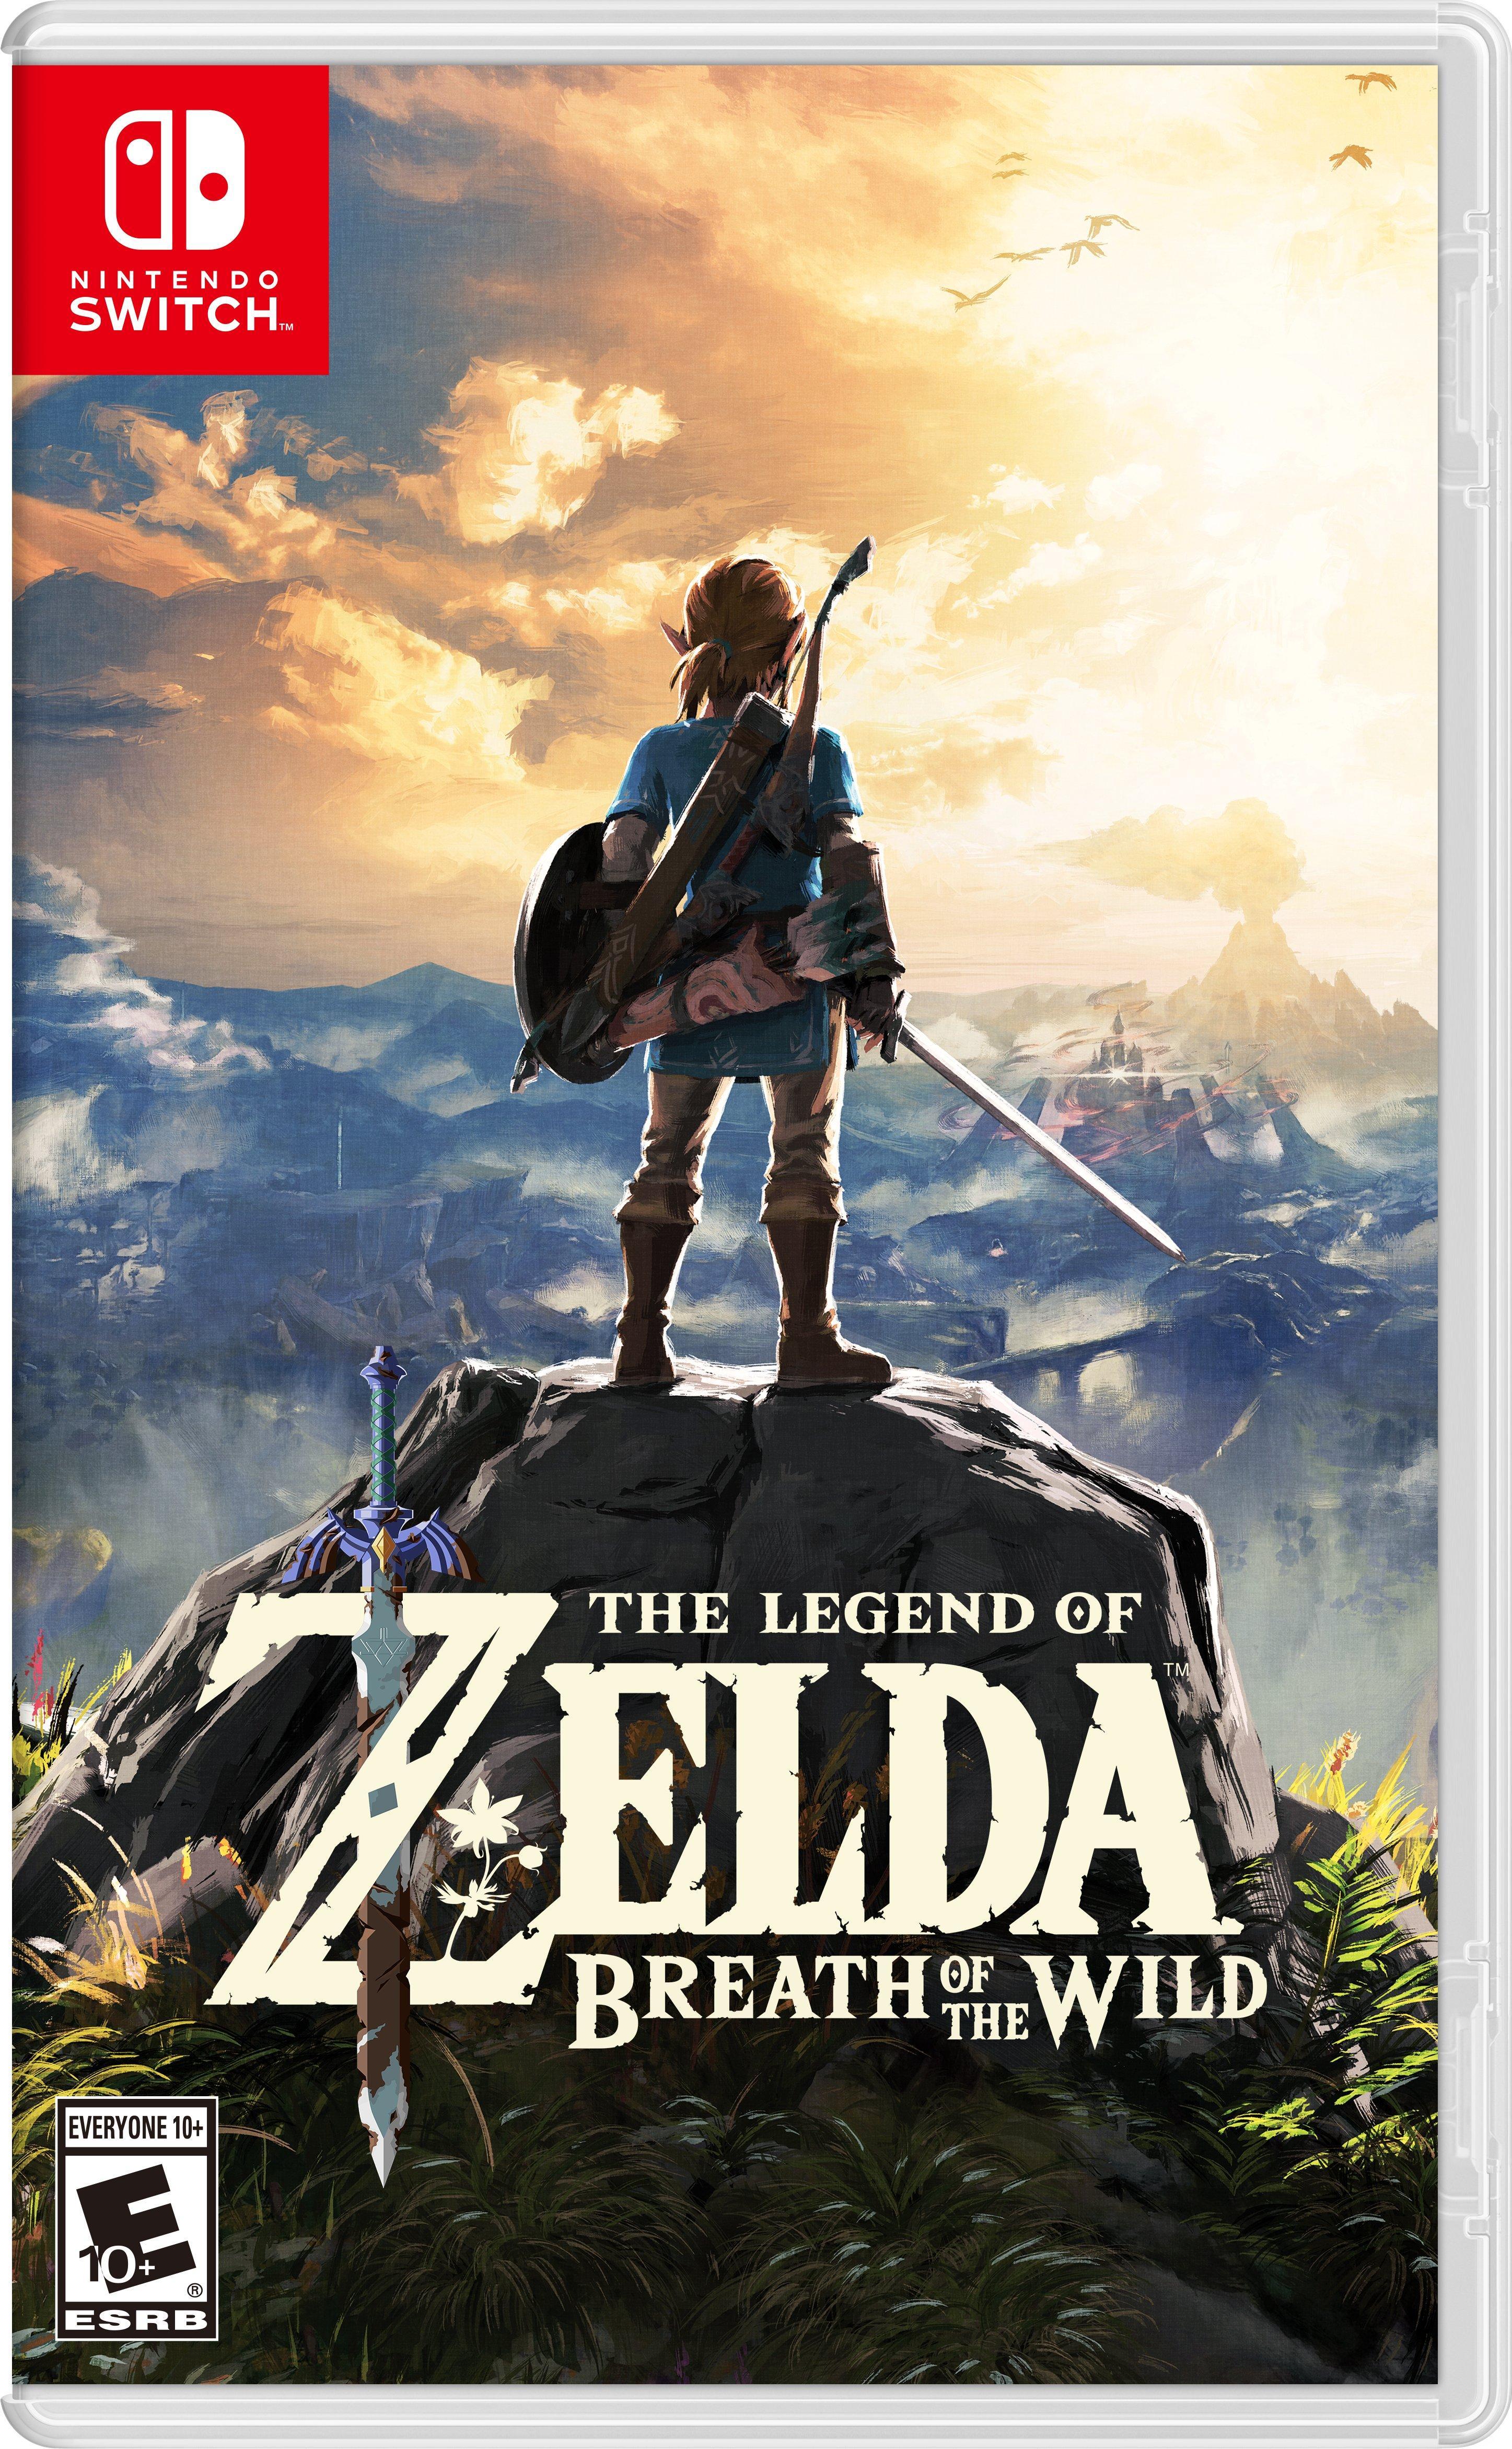 The Legend of Zelda: Breath of the Wild (Switch) - $49.94 @ Amazon